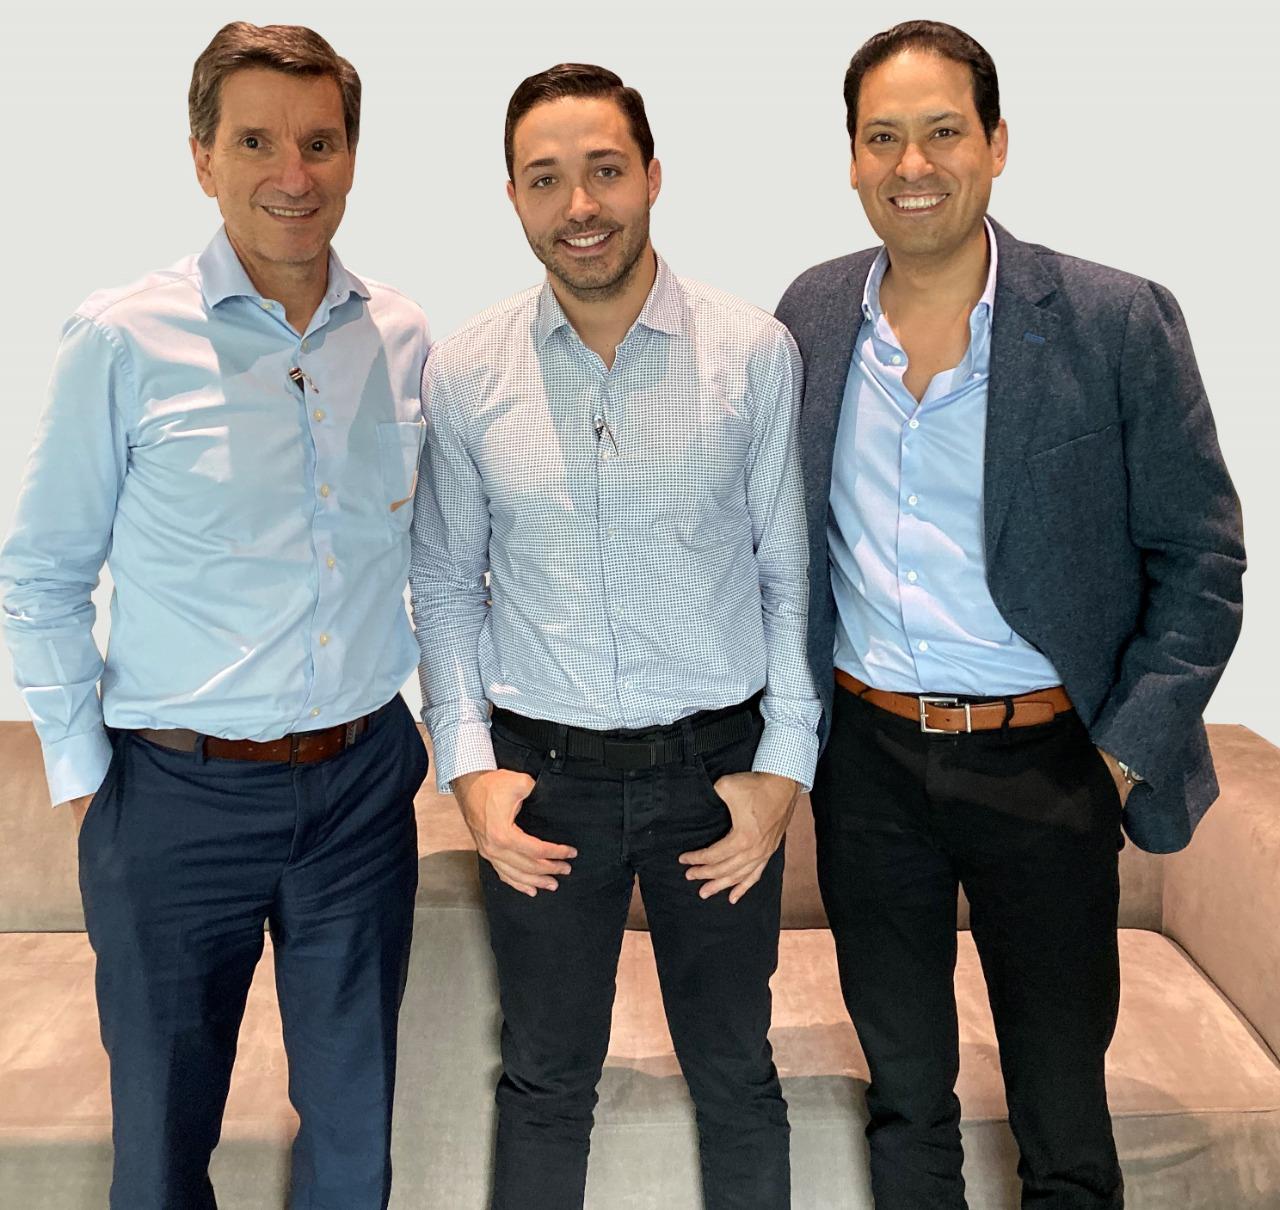 Juan Luis Aristizábal CEO Conconcreto; Juan Camilo Botero CEO Glasst Innovation Company; Juan Carlos Moreno CEO Pintuco